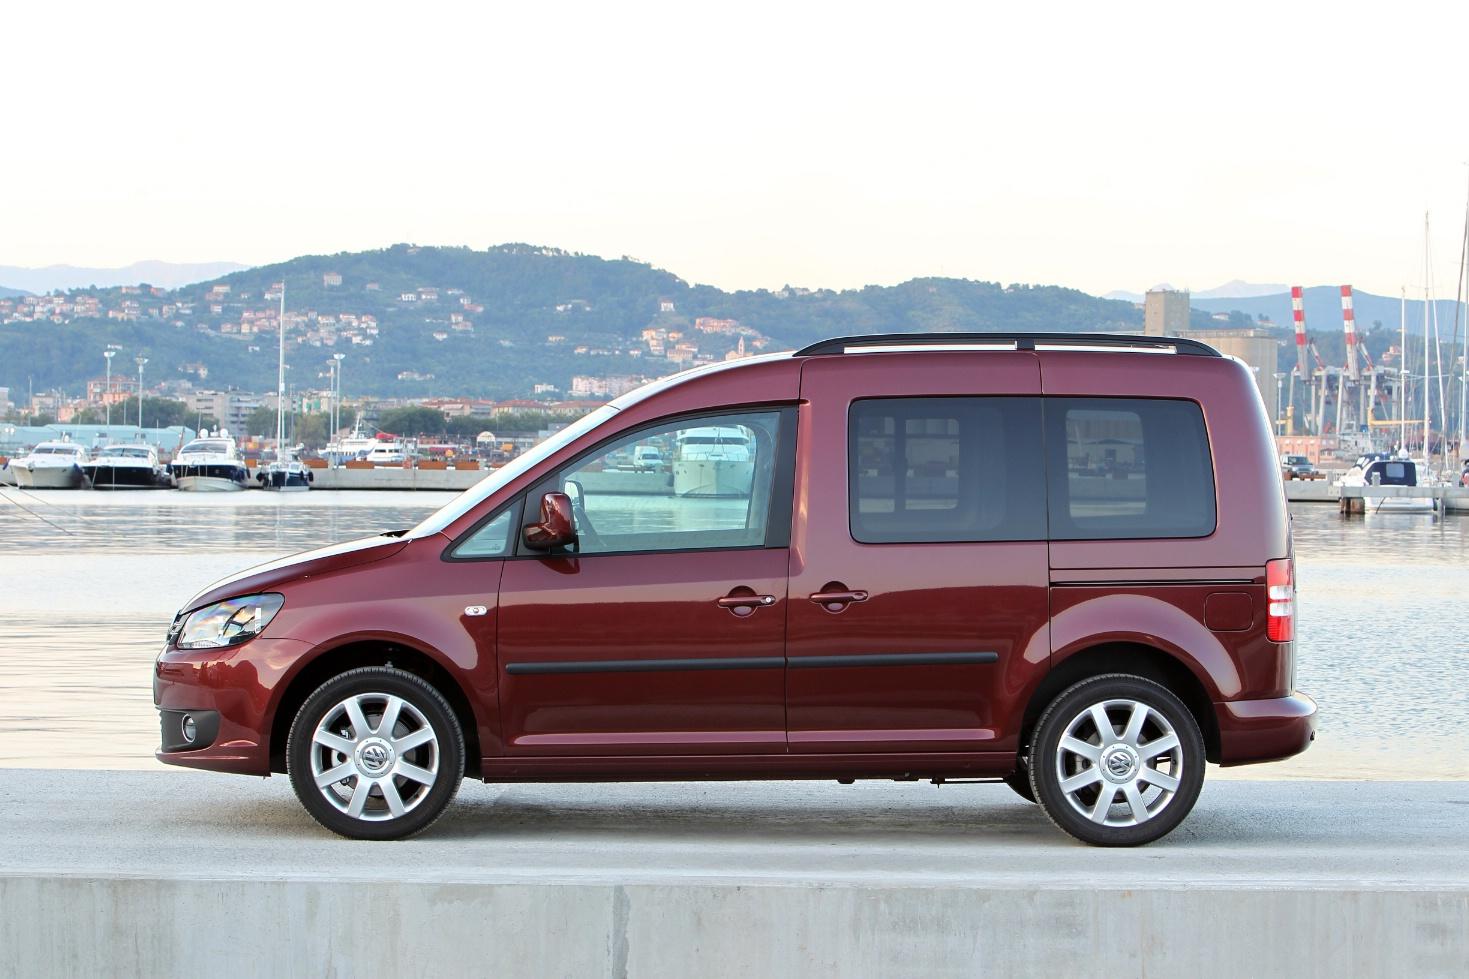 Volkswagen Caddy III 2004 - 2010 Compact MPV #2